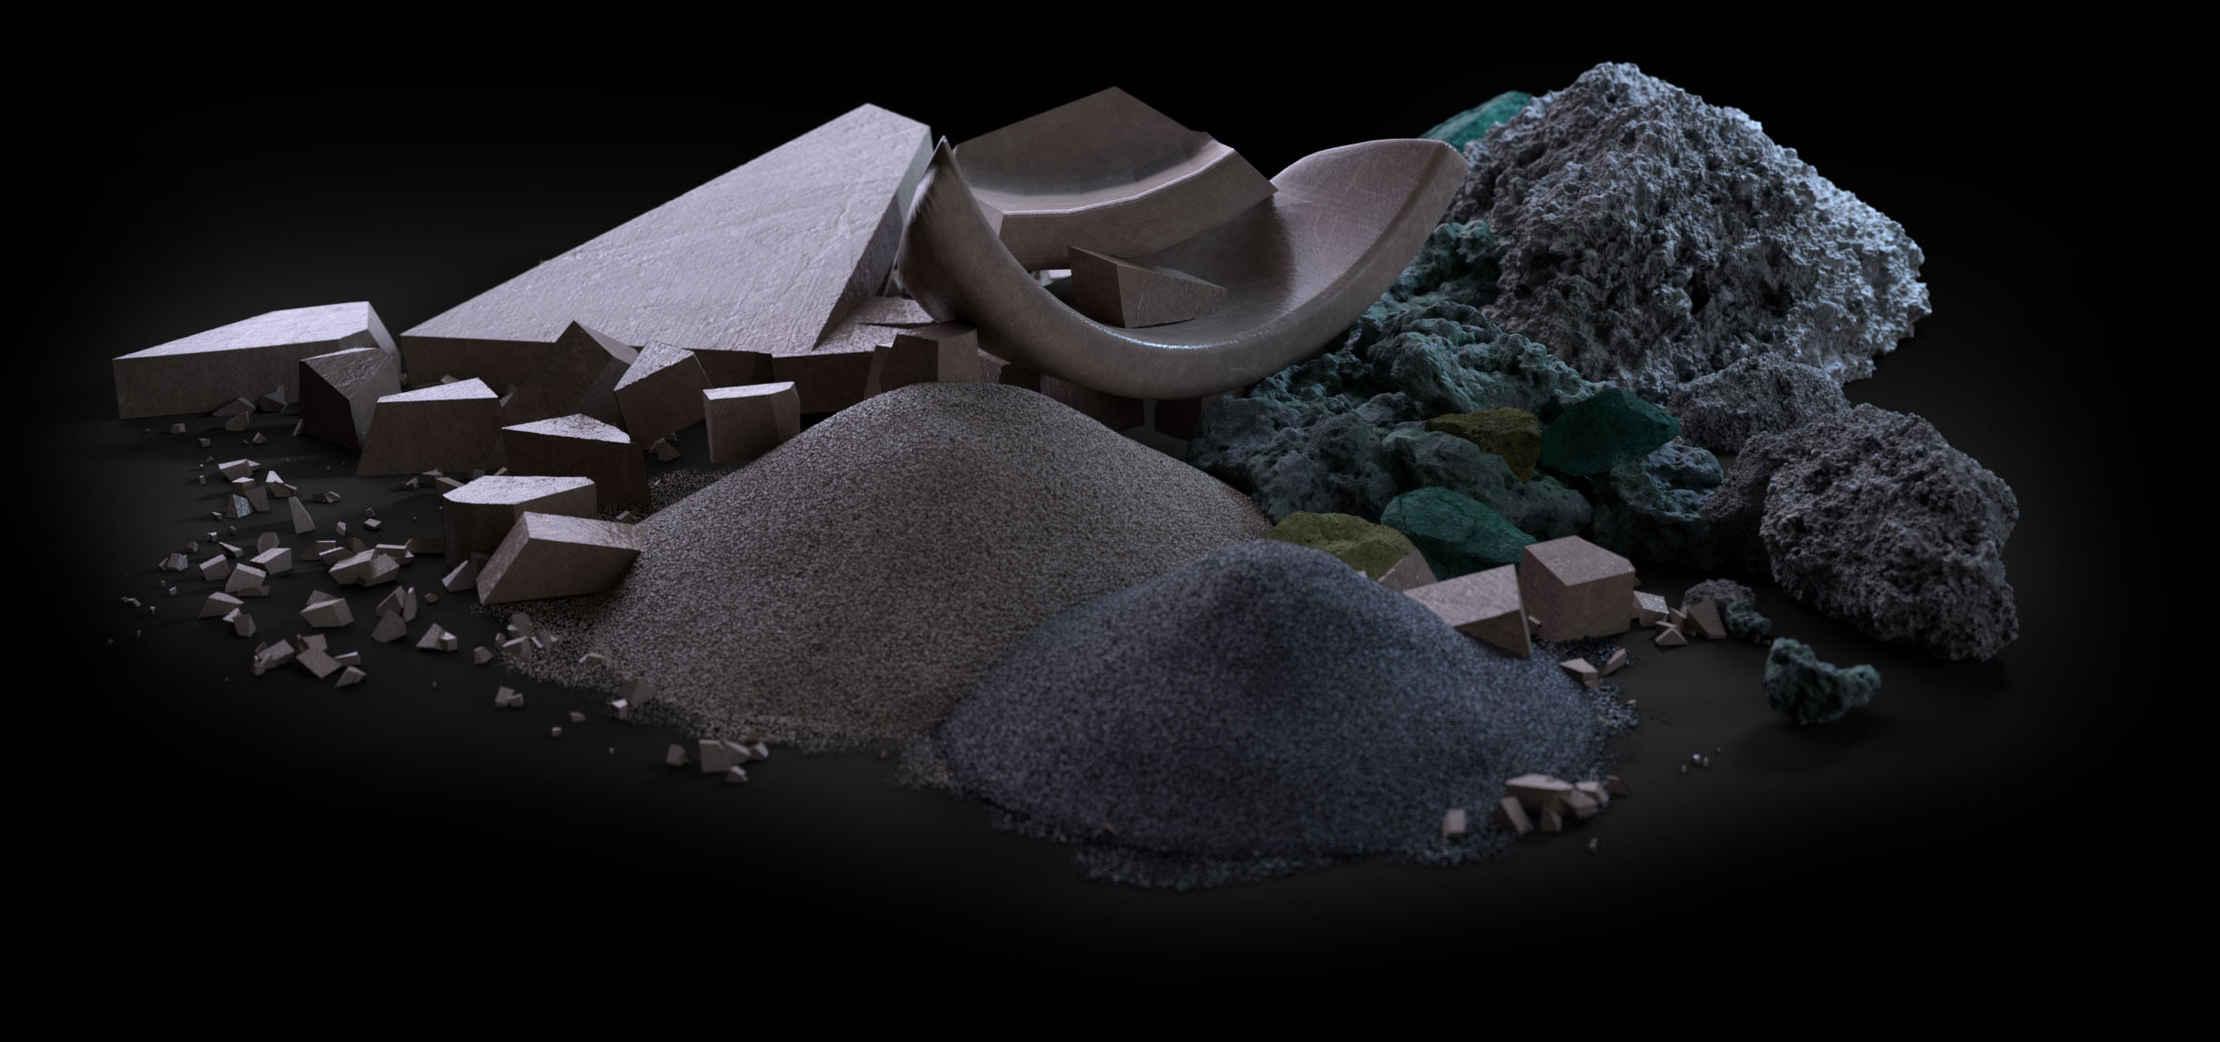 mairec edelmetall precious metals recycling material gekraetz konzentrate dross concentrates